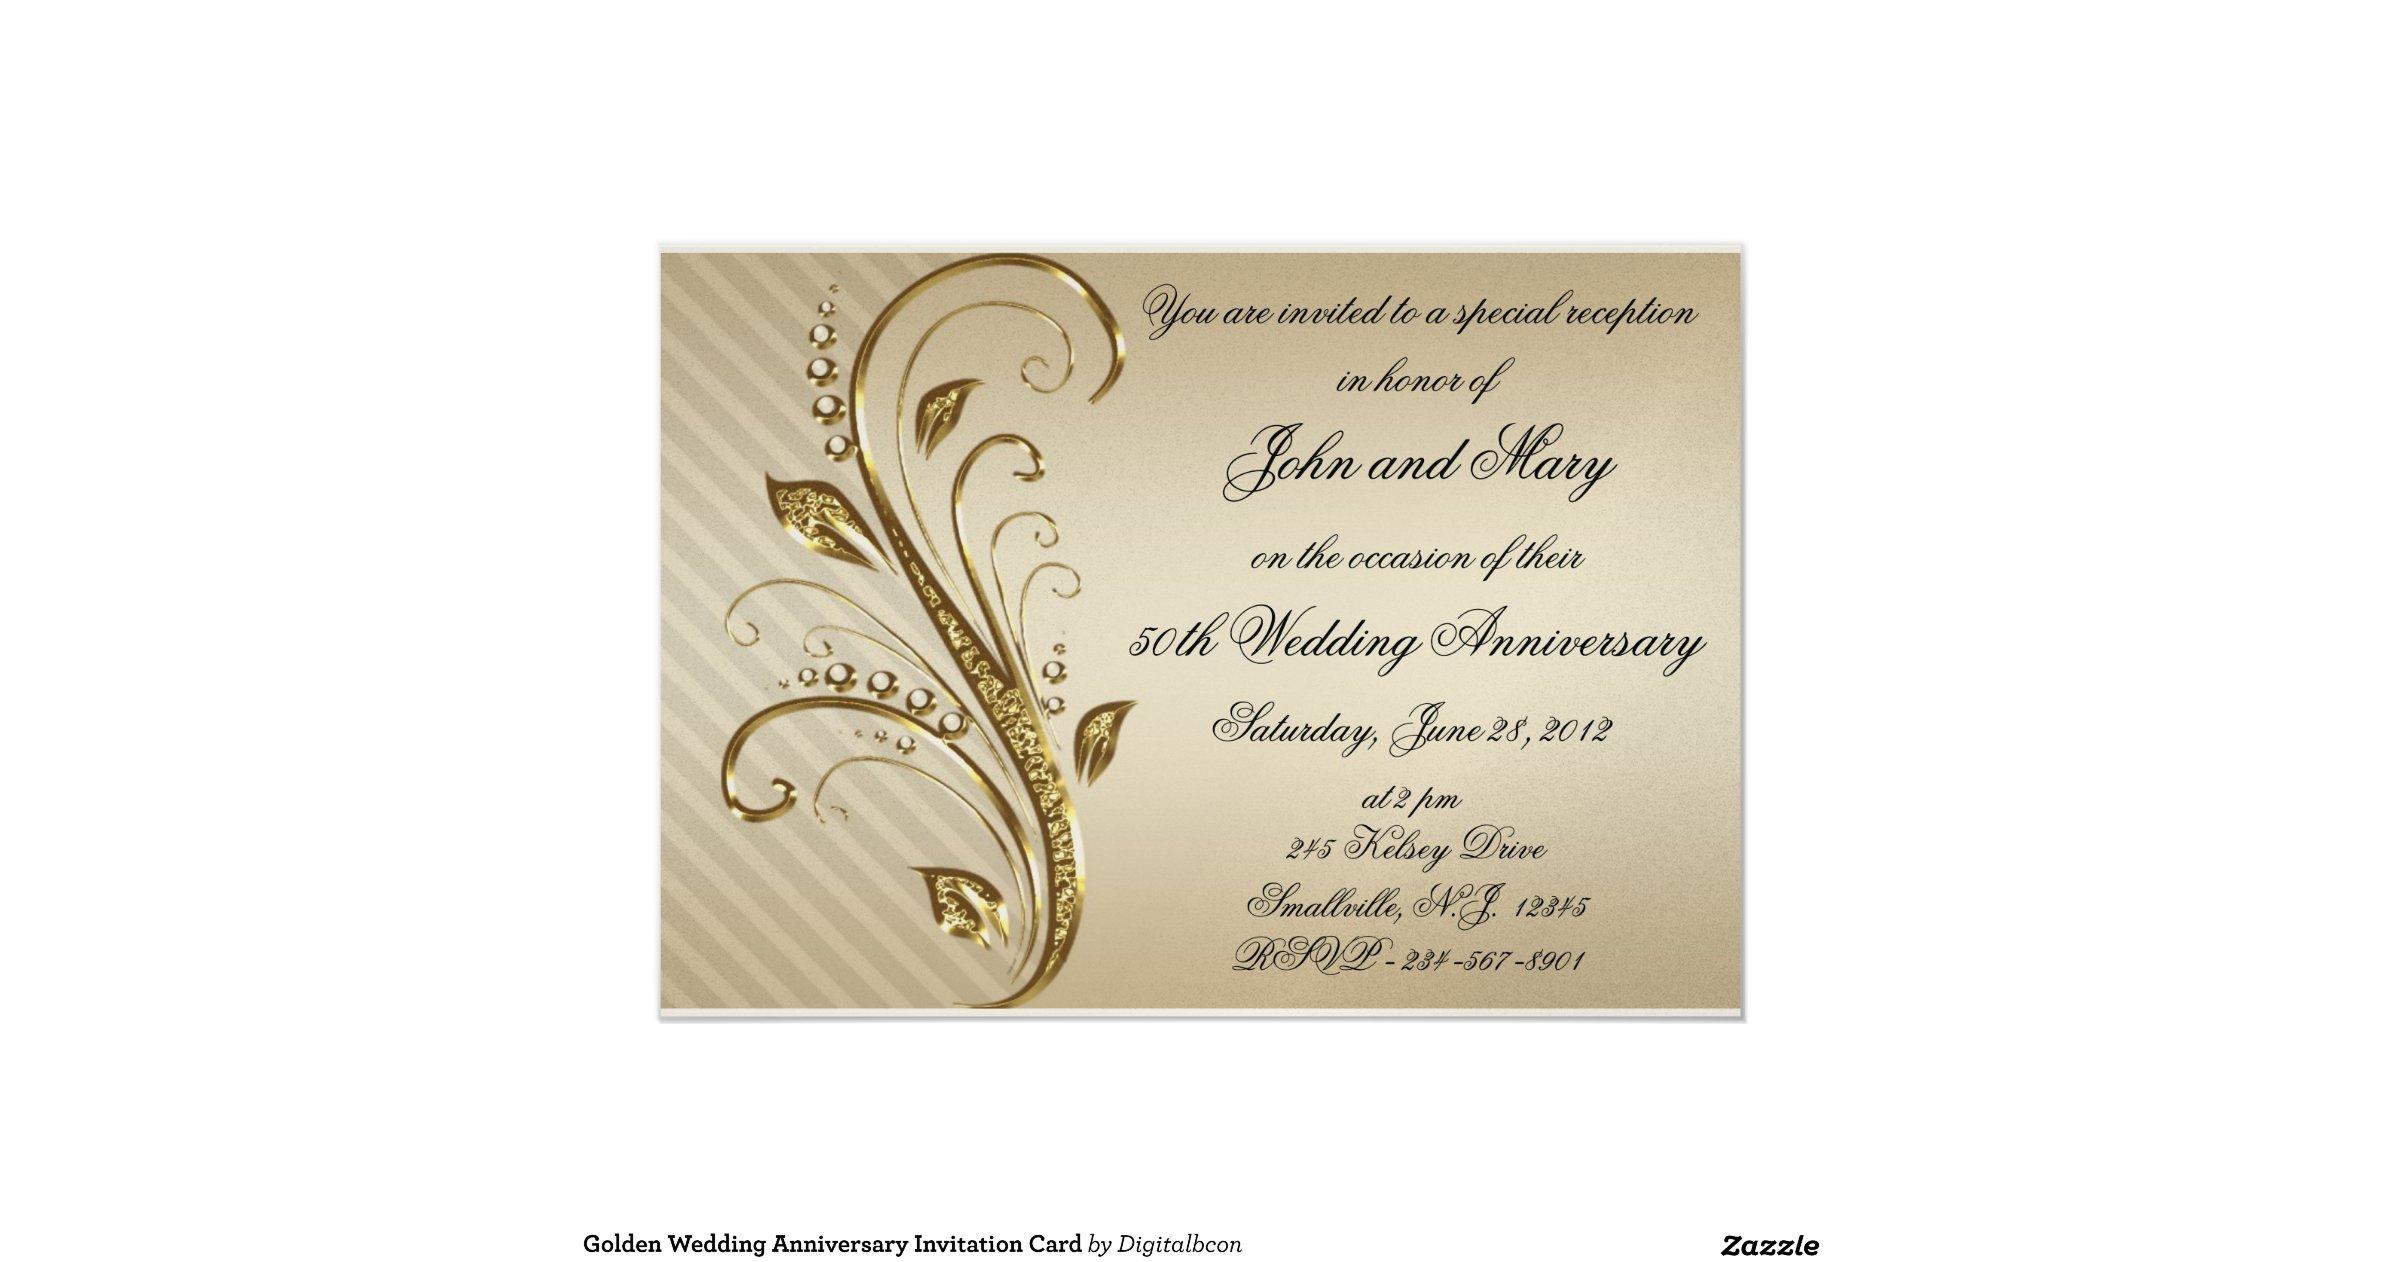 Golden Wedding Anniversary Invitations: Golden_wedding_anniversary_invitation_card